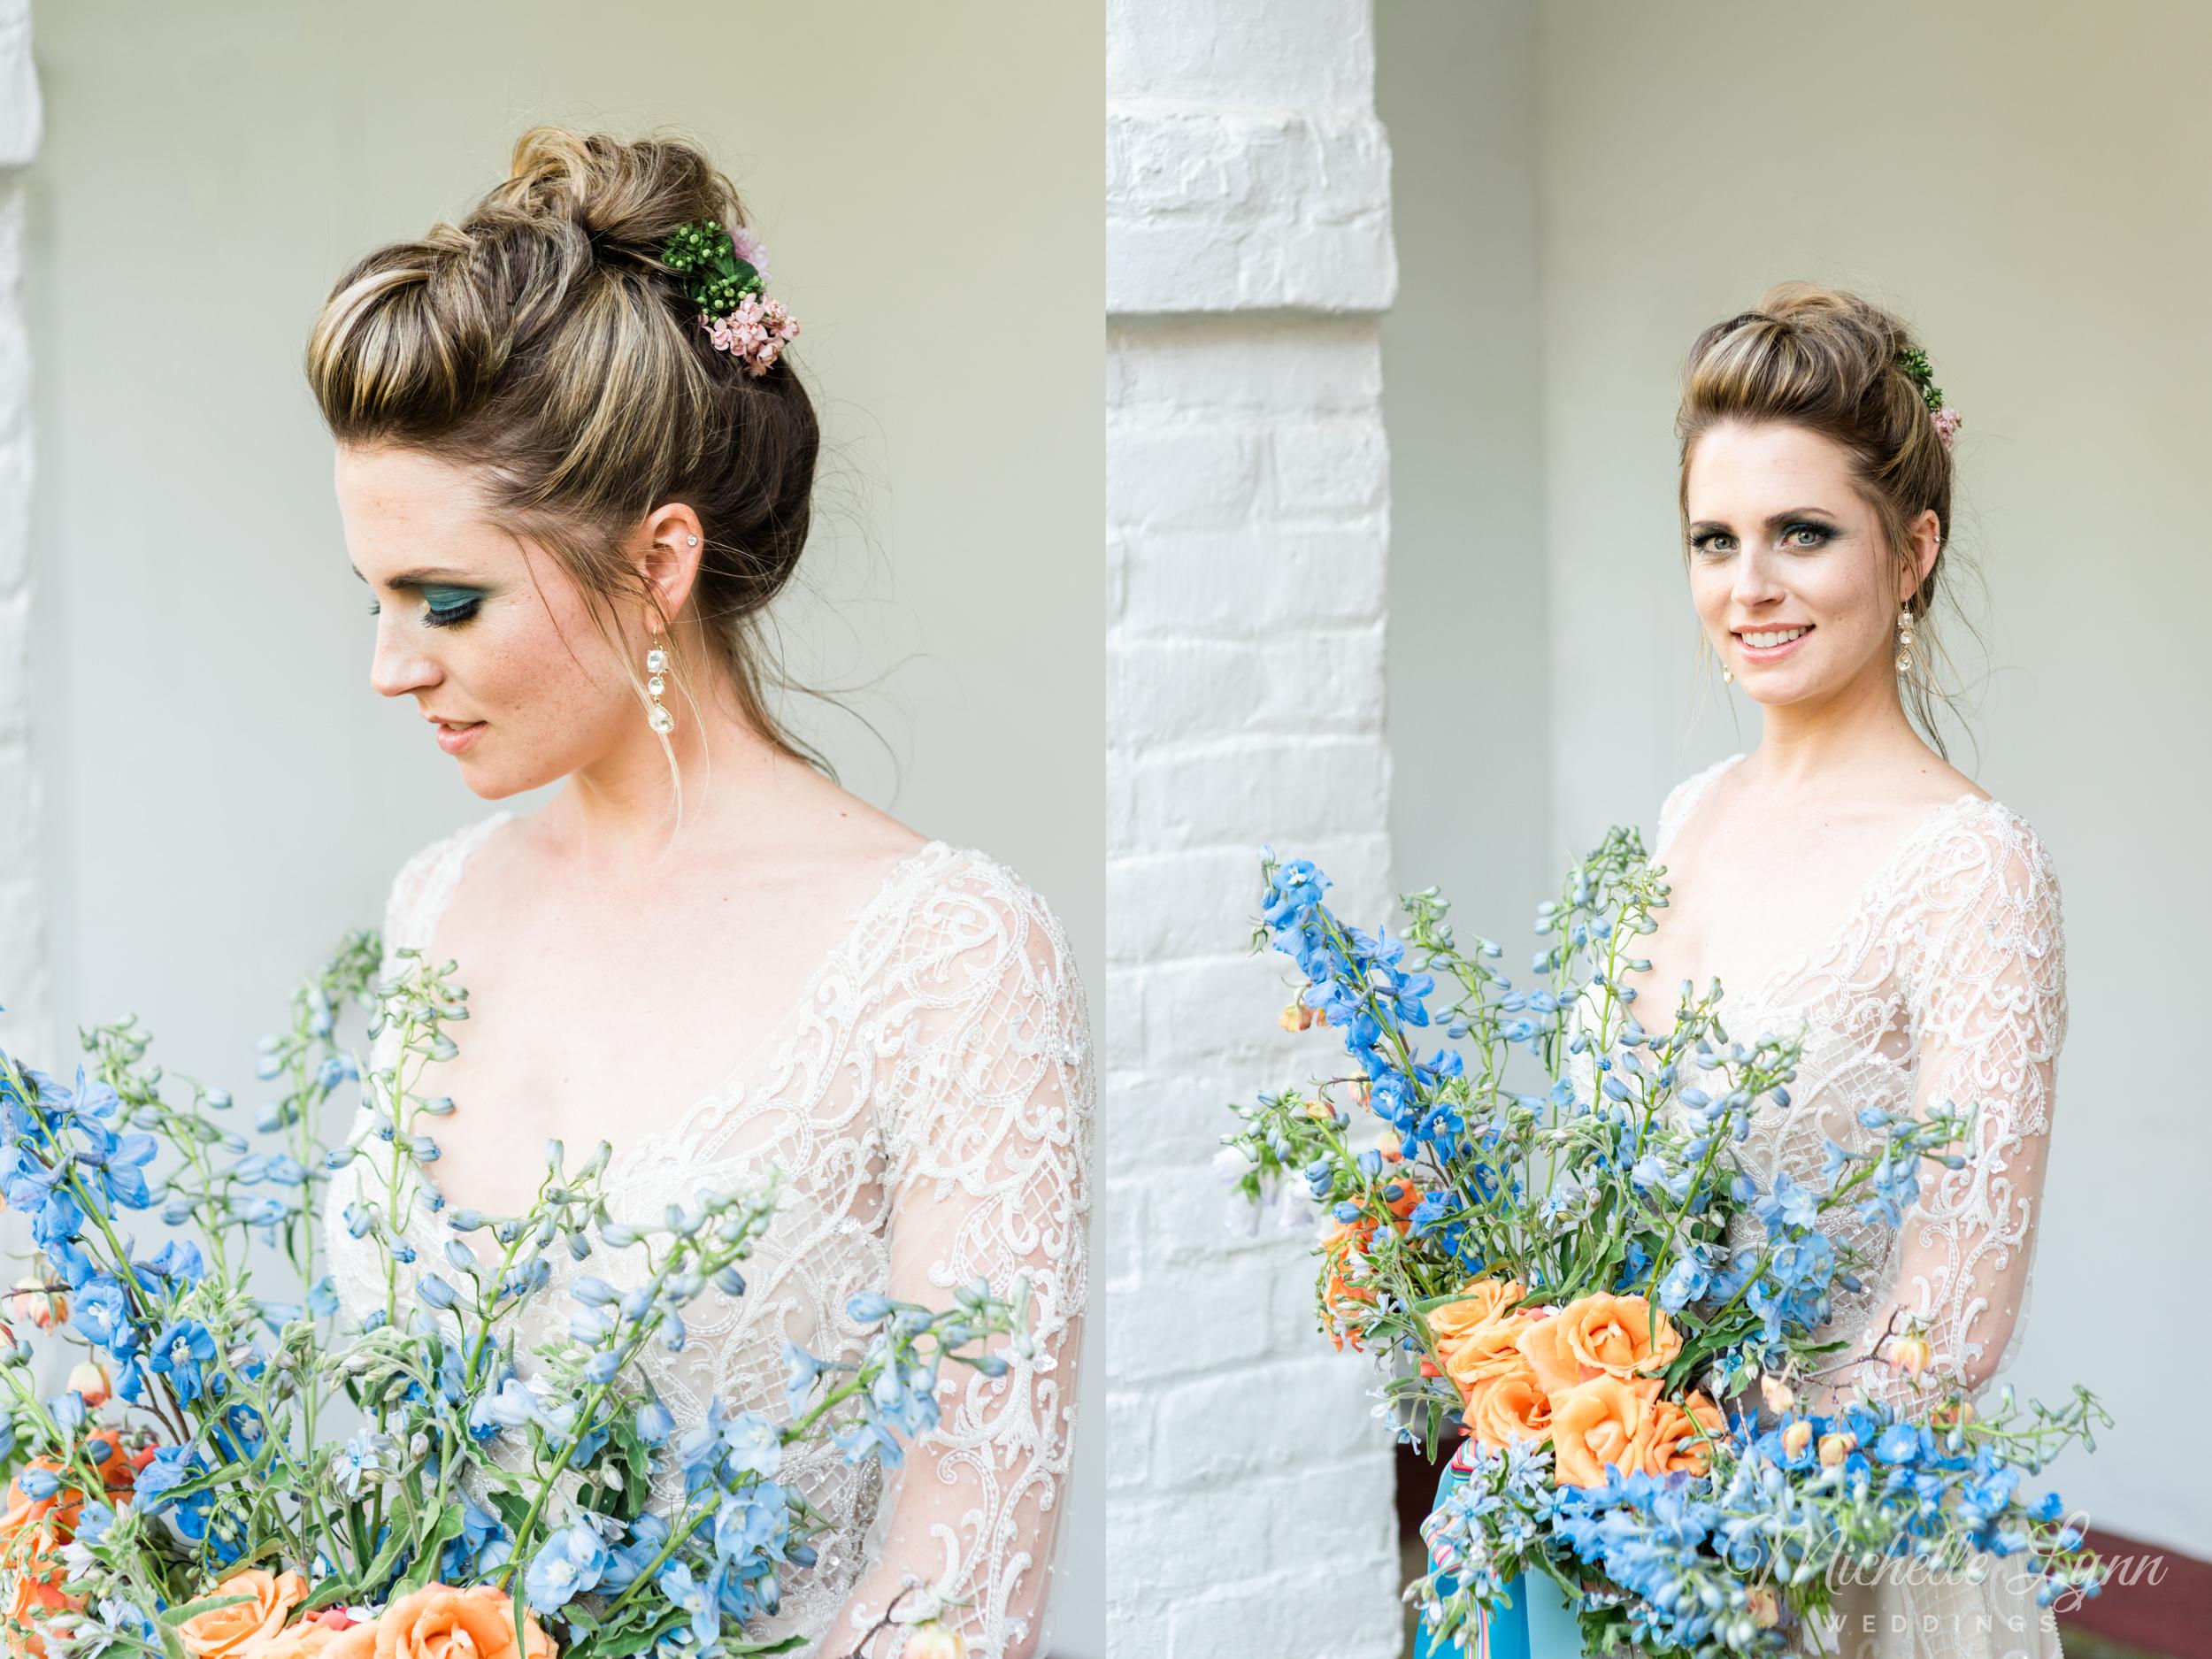 mlw-whitehall-annapolis-wedding-photography-8.jpg